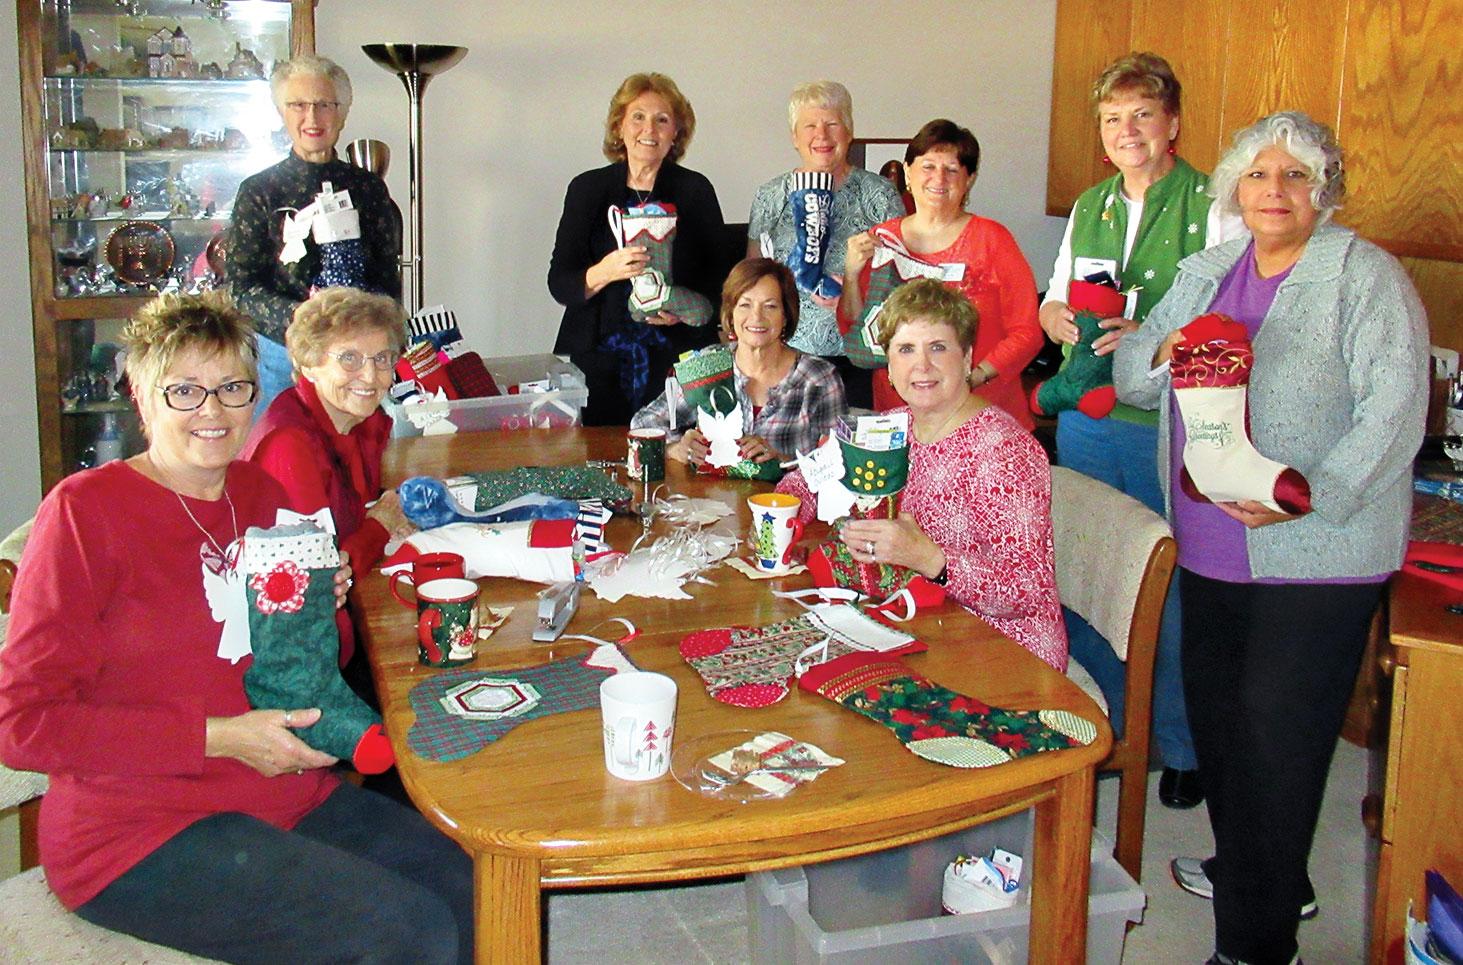 Stocking stuffers: Nancy Myers, Helen Reed, Karen Wesselman, Donna Chabot, Theresa Peoples, Nancy Nevius, LInda Smith, BJ Watson, Nancy Thomas and Emilia Bevington